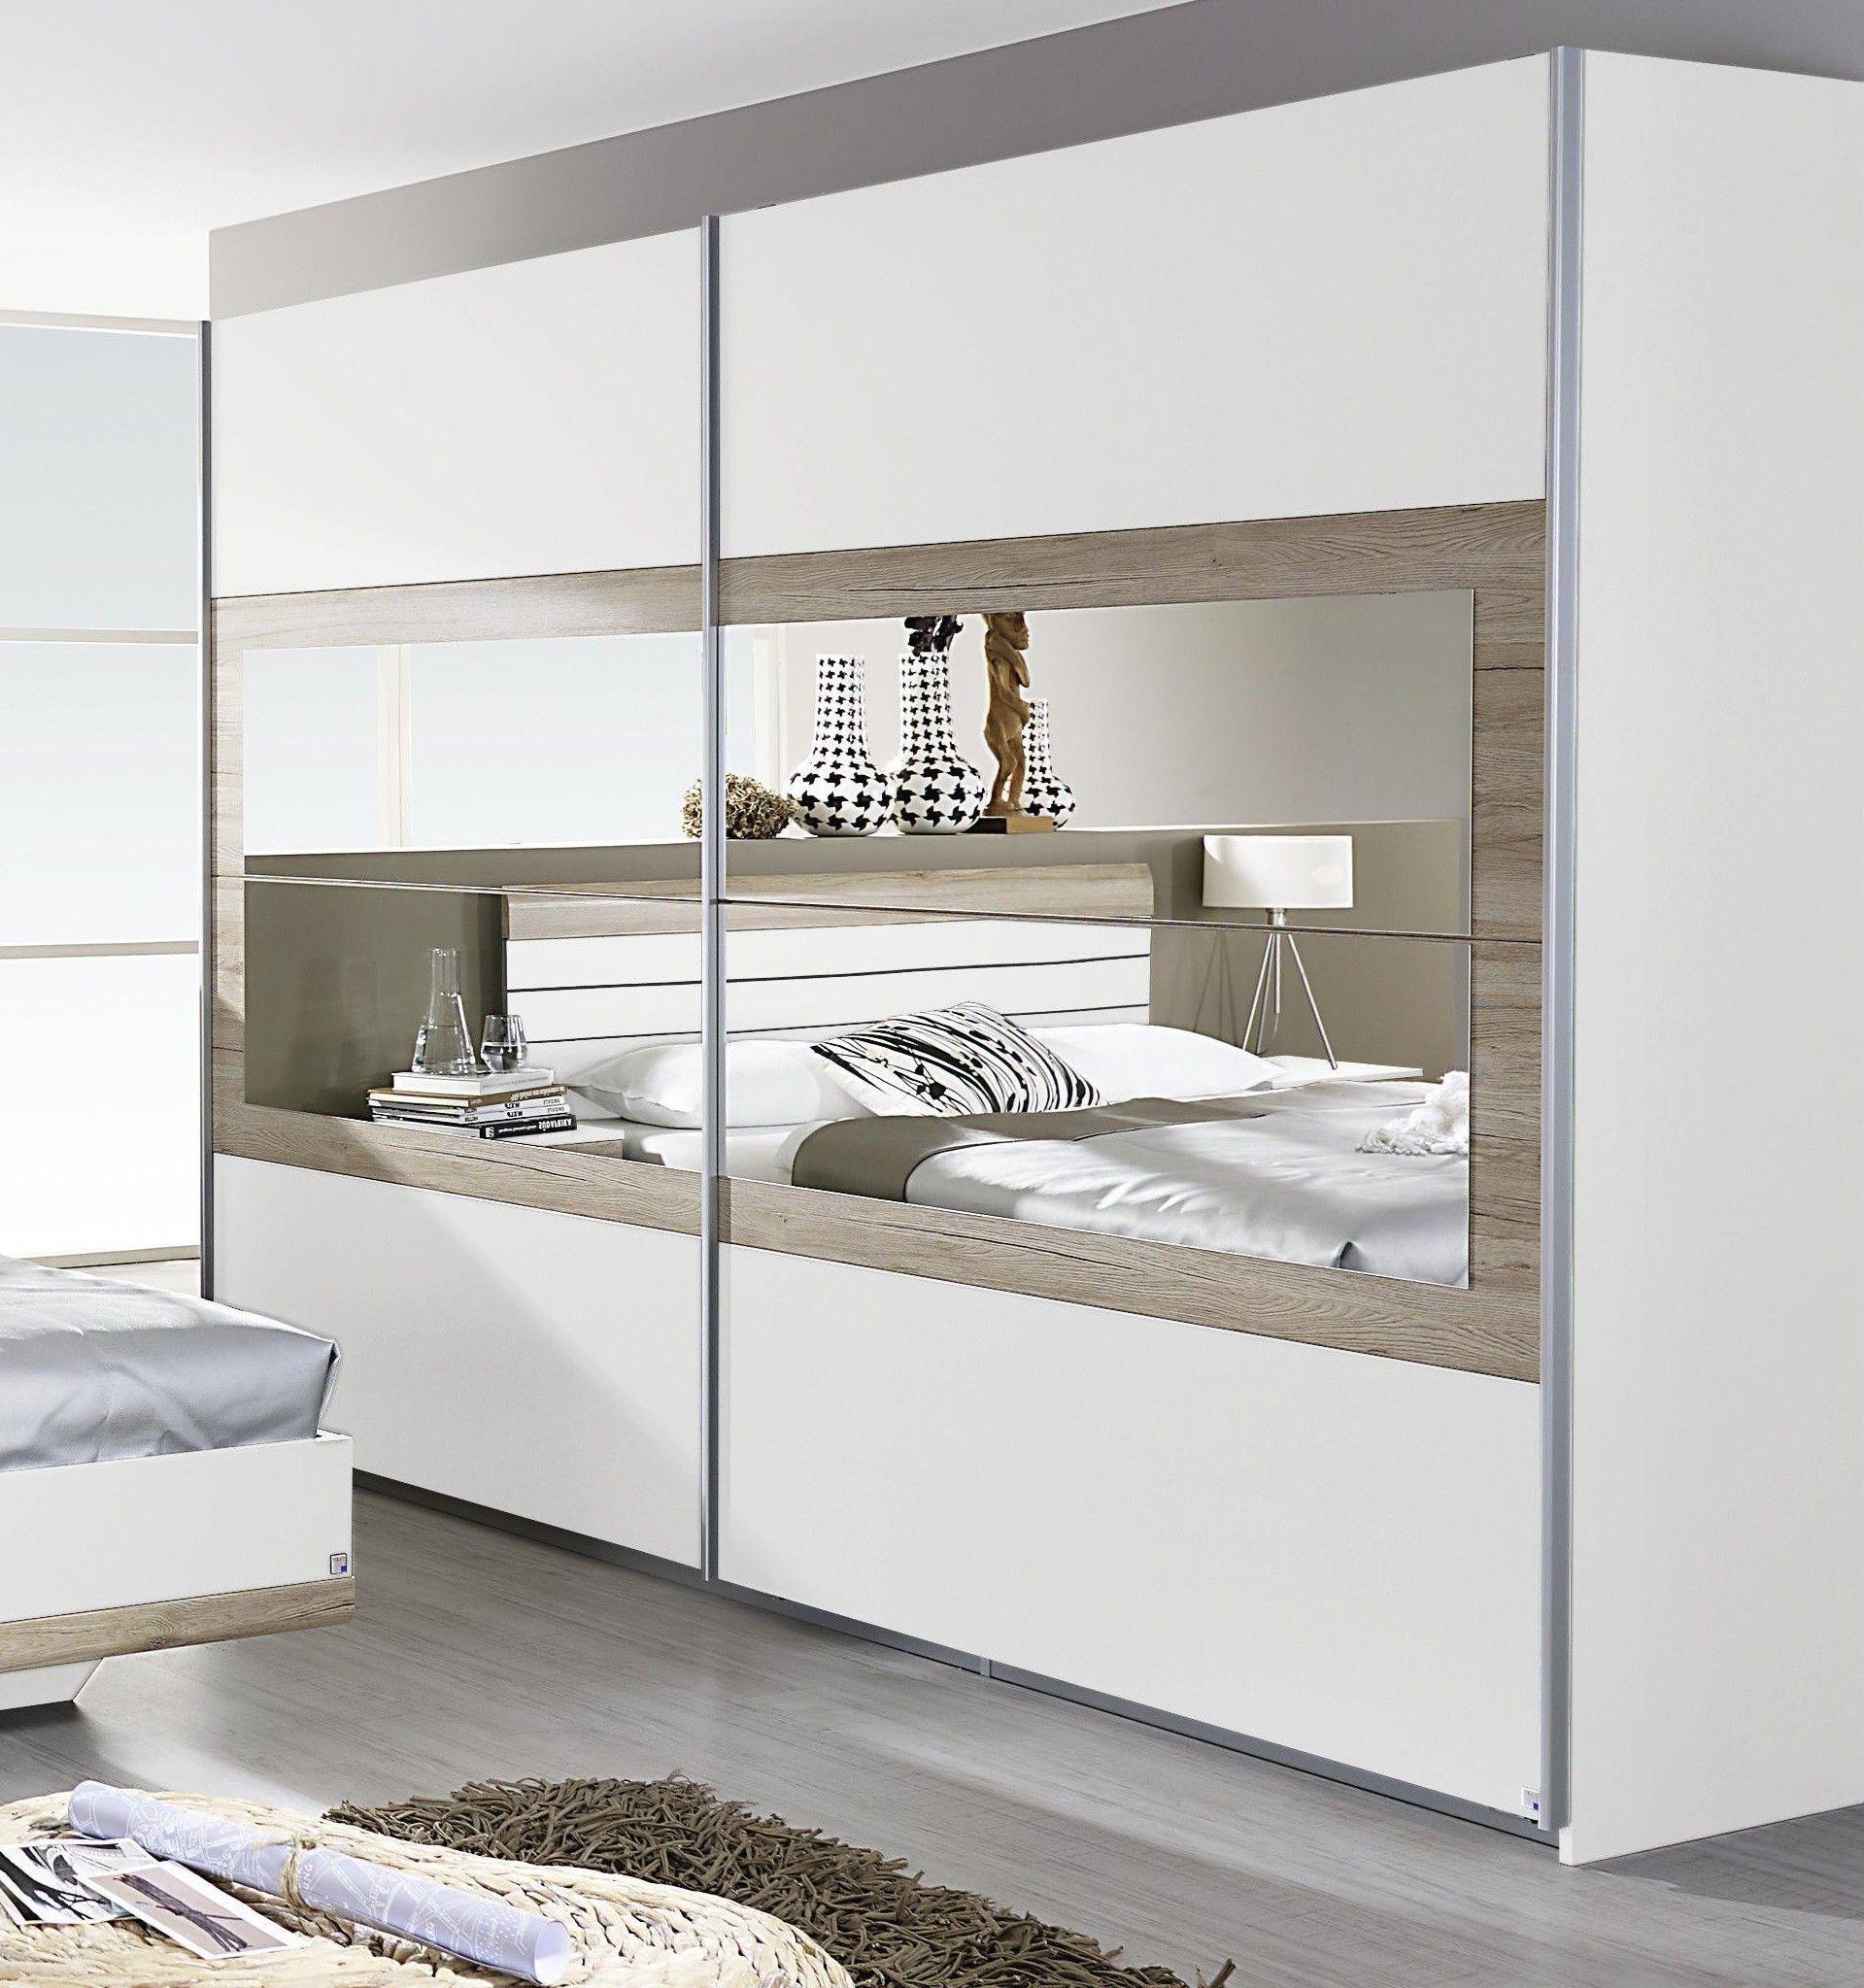 armoire contemporaine 2 portes coulissantes 271 cm blanche ch ne clair tamara. Black Bedroom Furniture Sets. Home Design Ideas